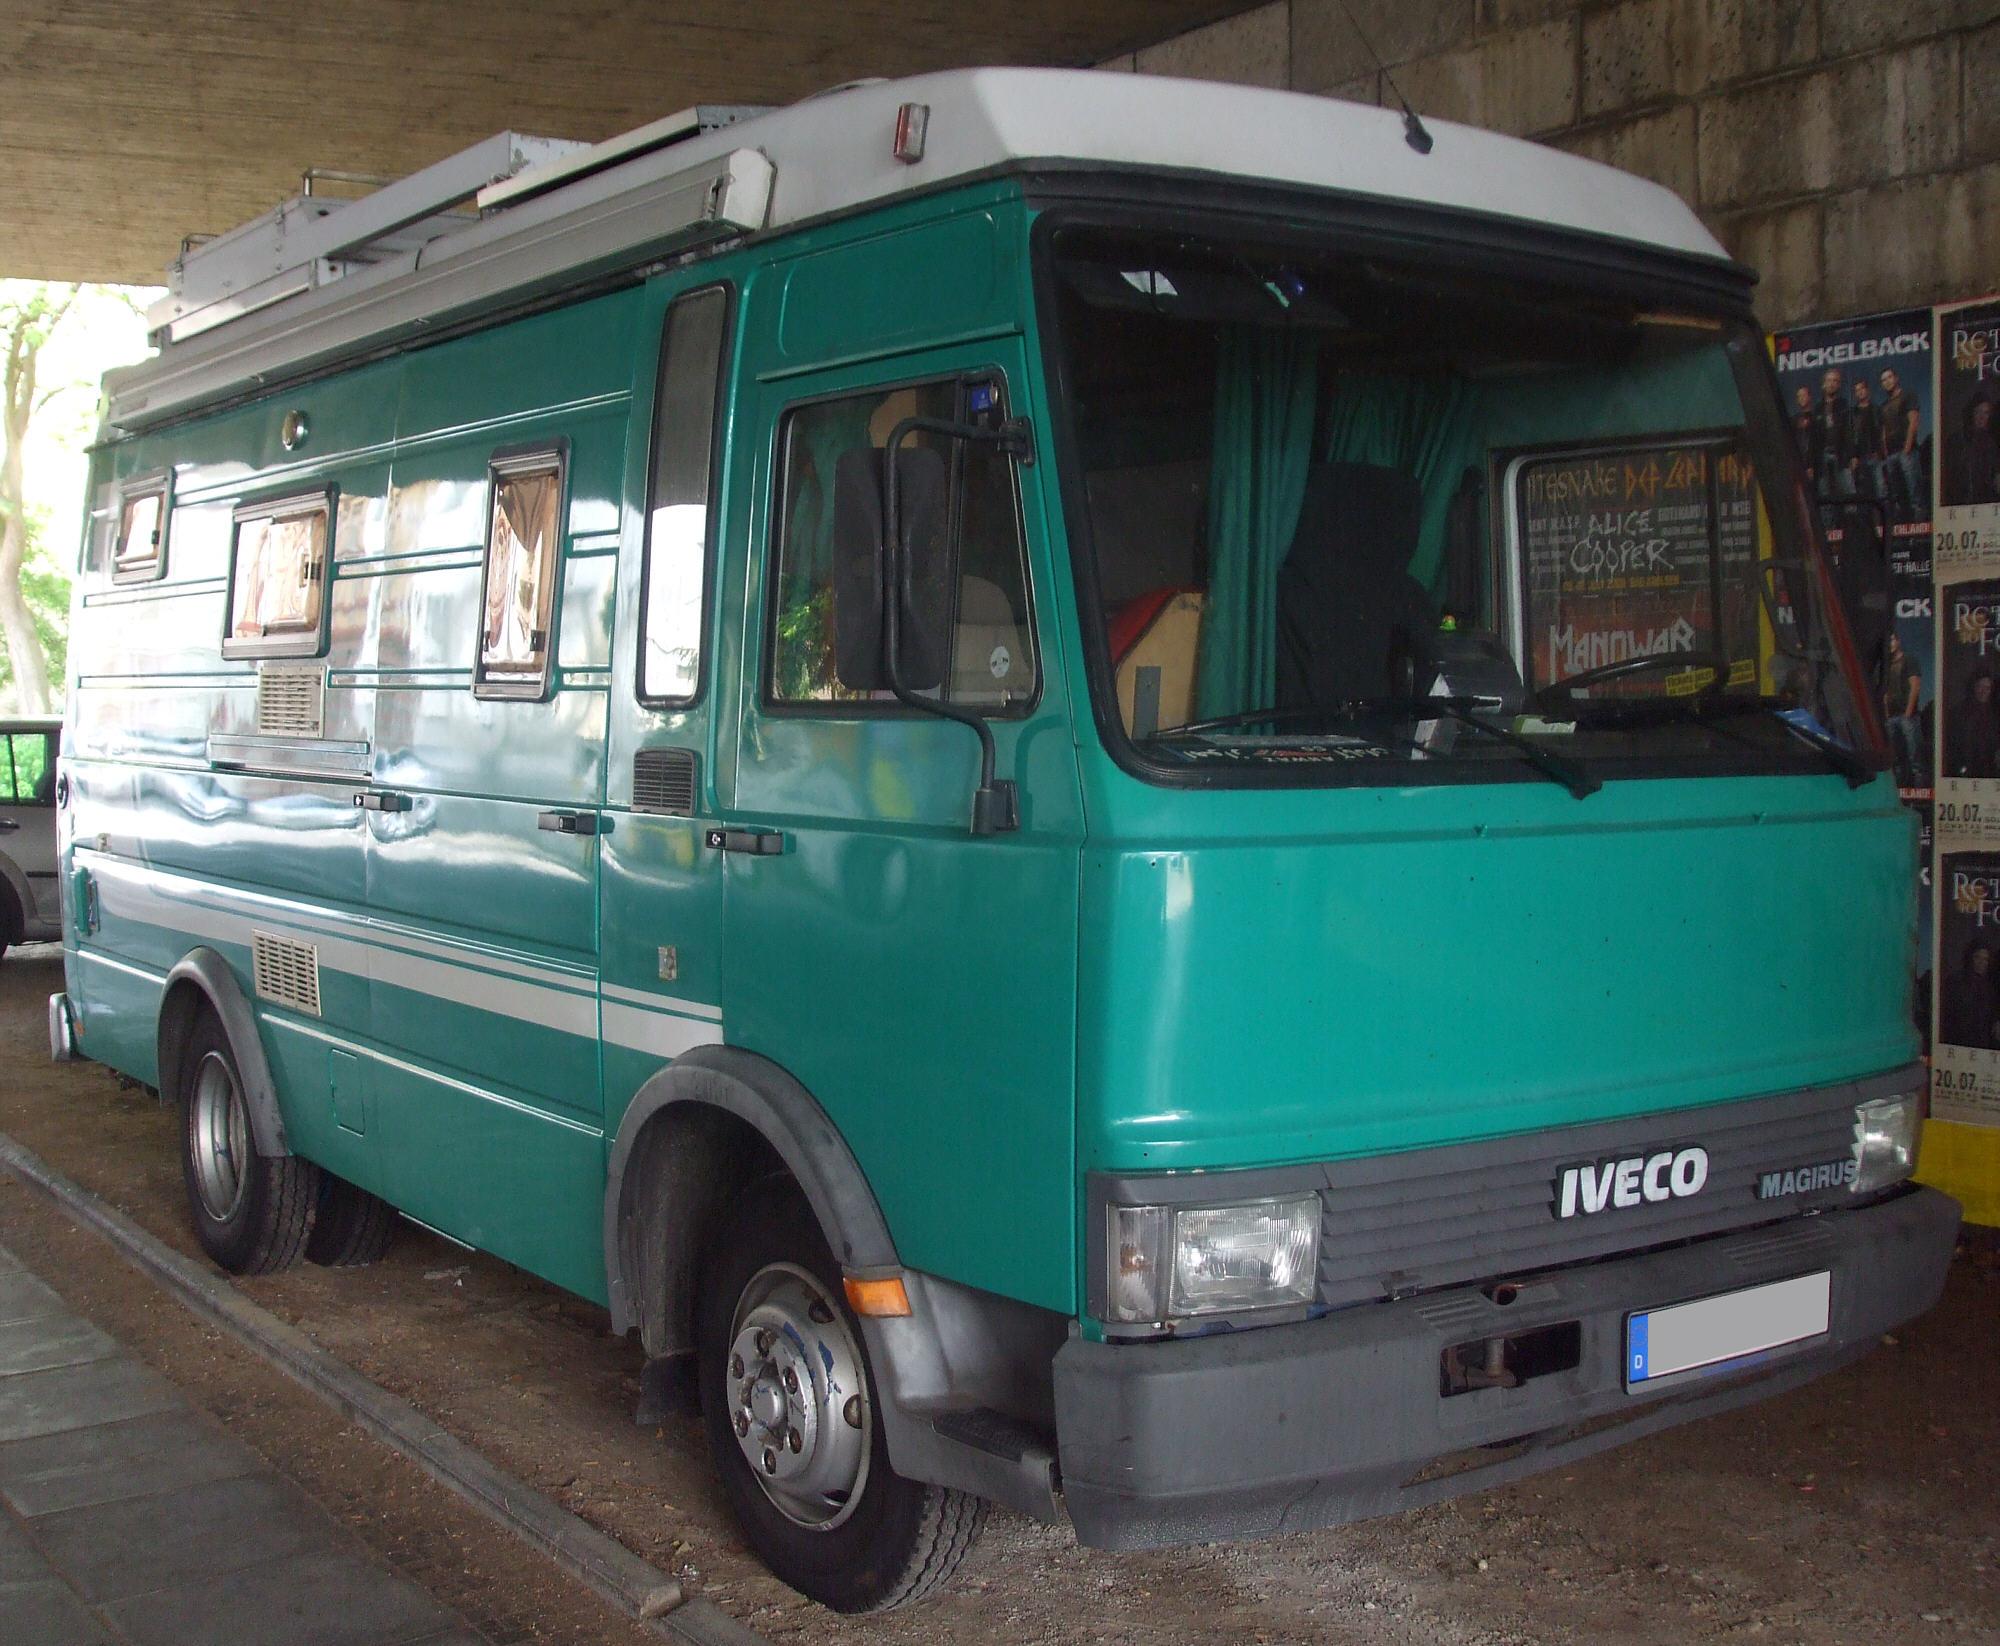 File:Großes grünes IVECO-Wohnmobil vr.jpg - Wikimedia Commons